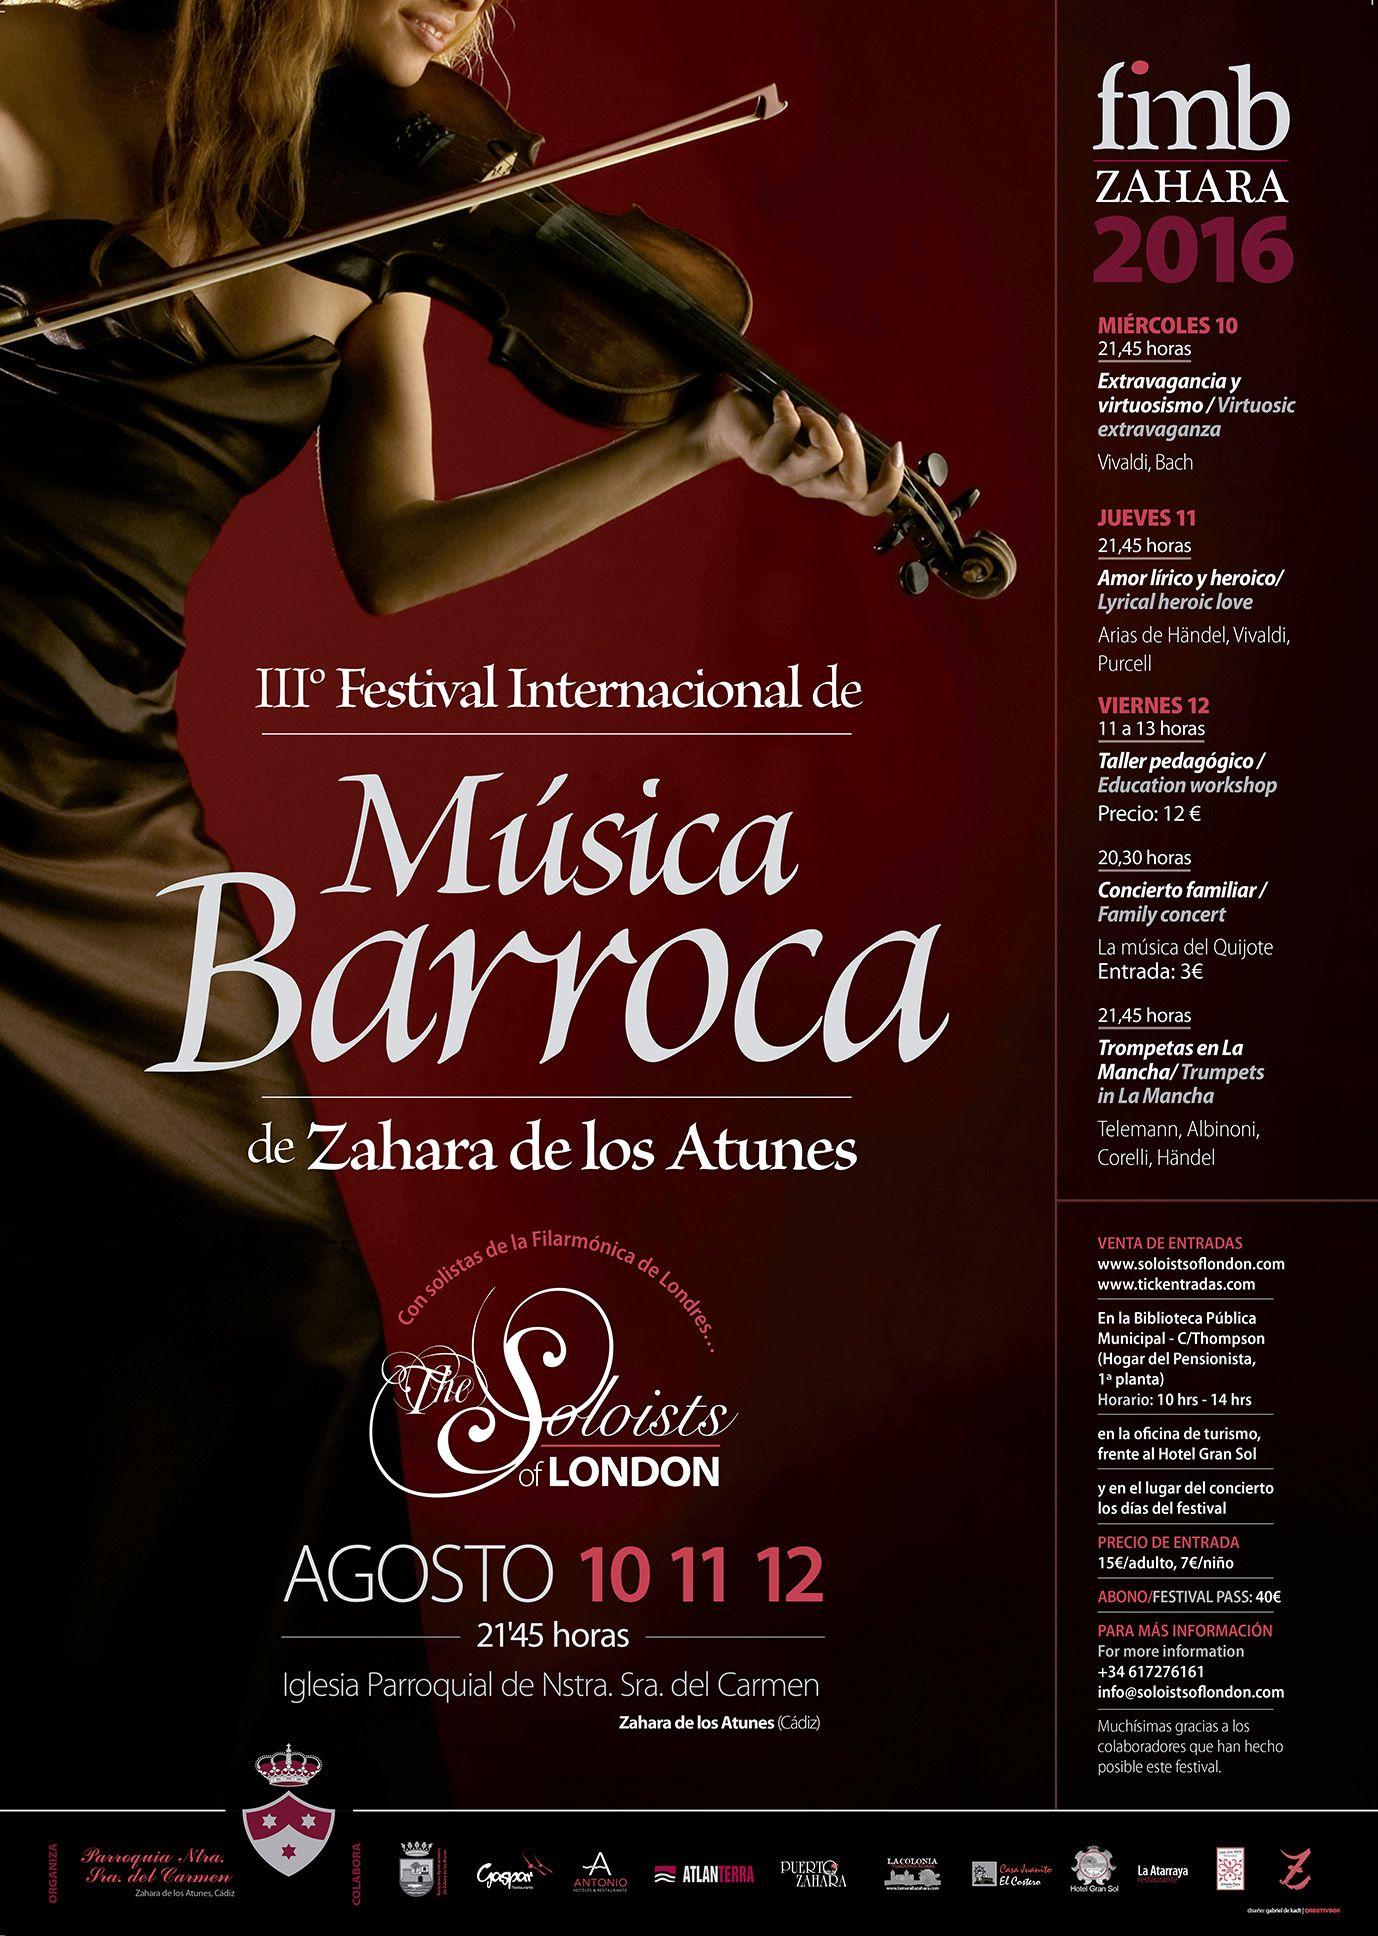 cartel musica barroca zahara